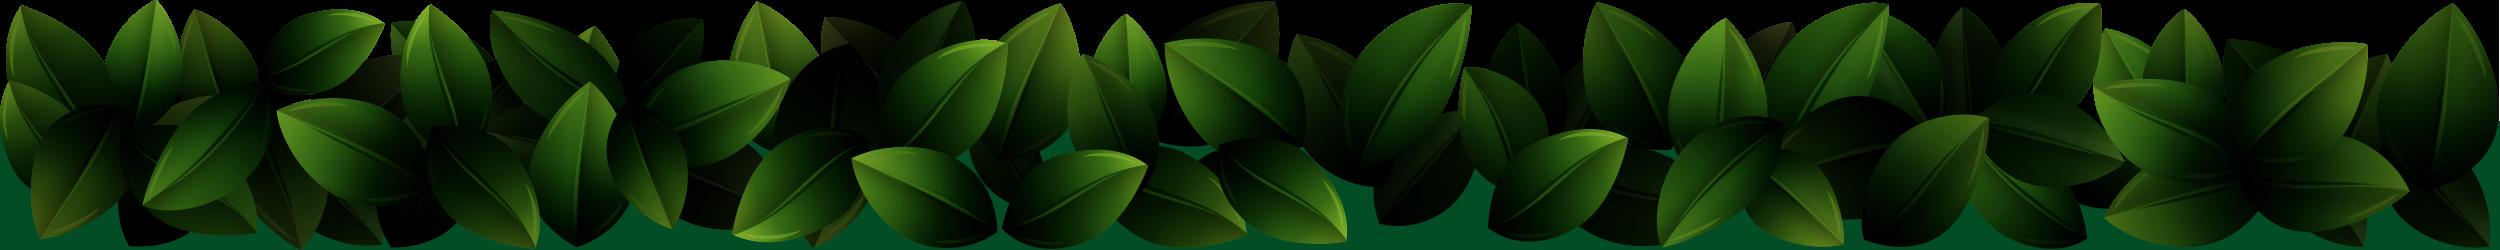 leaf-border-footer-menu-dark